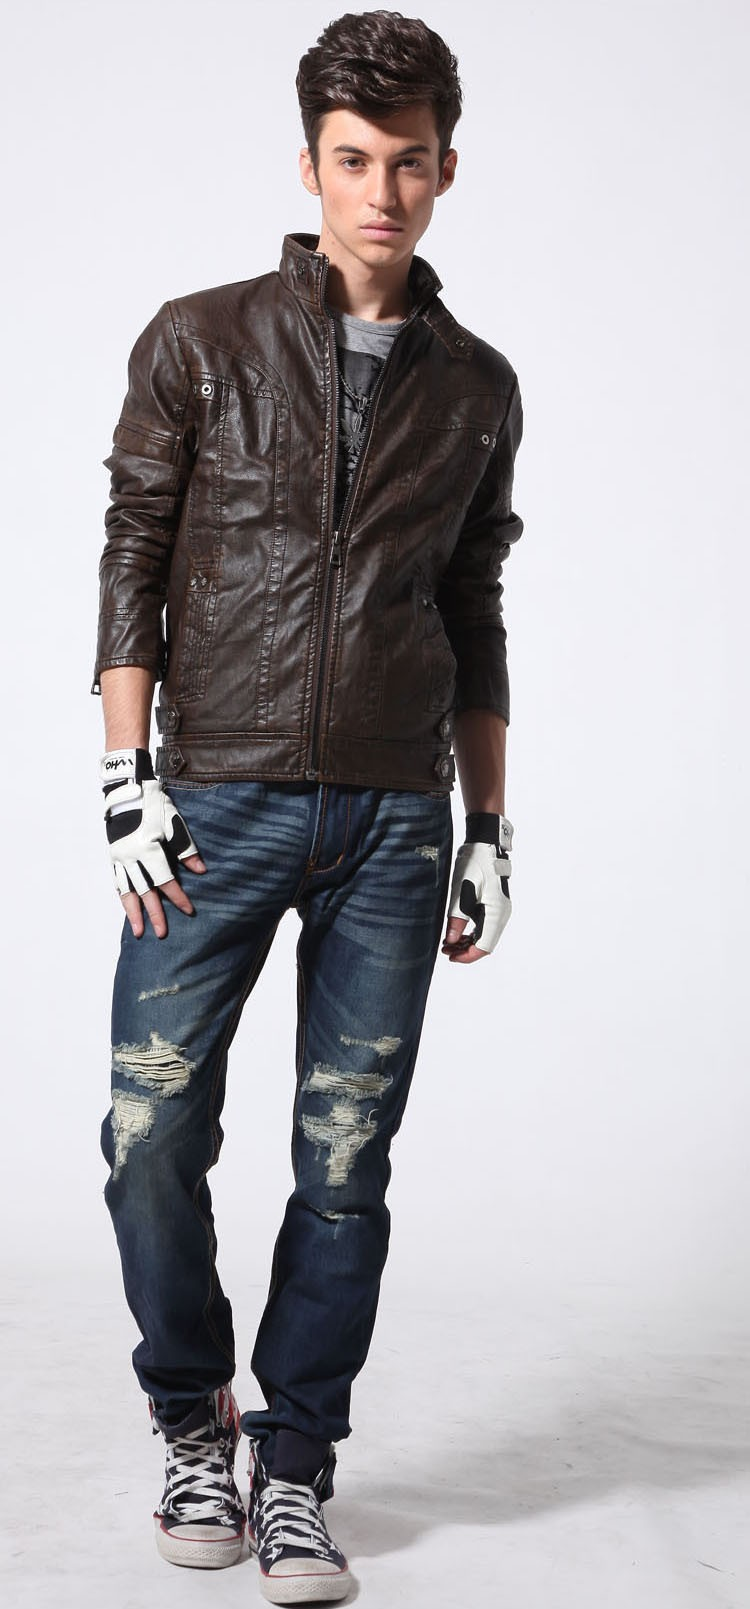 PU Leather Jacket Men 2016 Fall Winter Fashion Faux Fur Bomber Motercycle Biker Jacket High Quality Plus Velvet Casual Outwear (2)